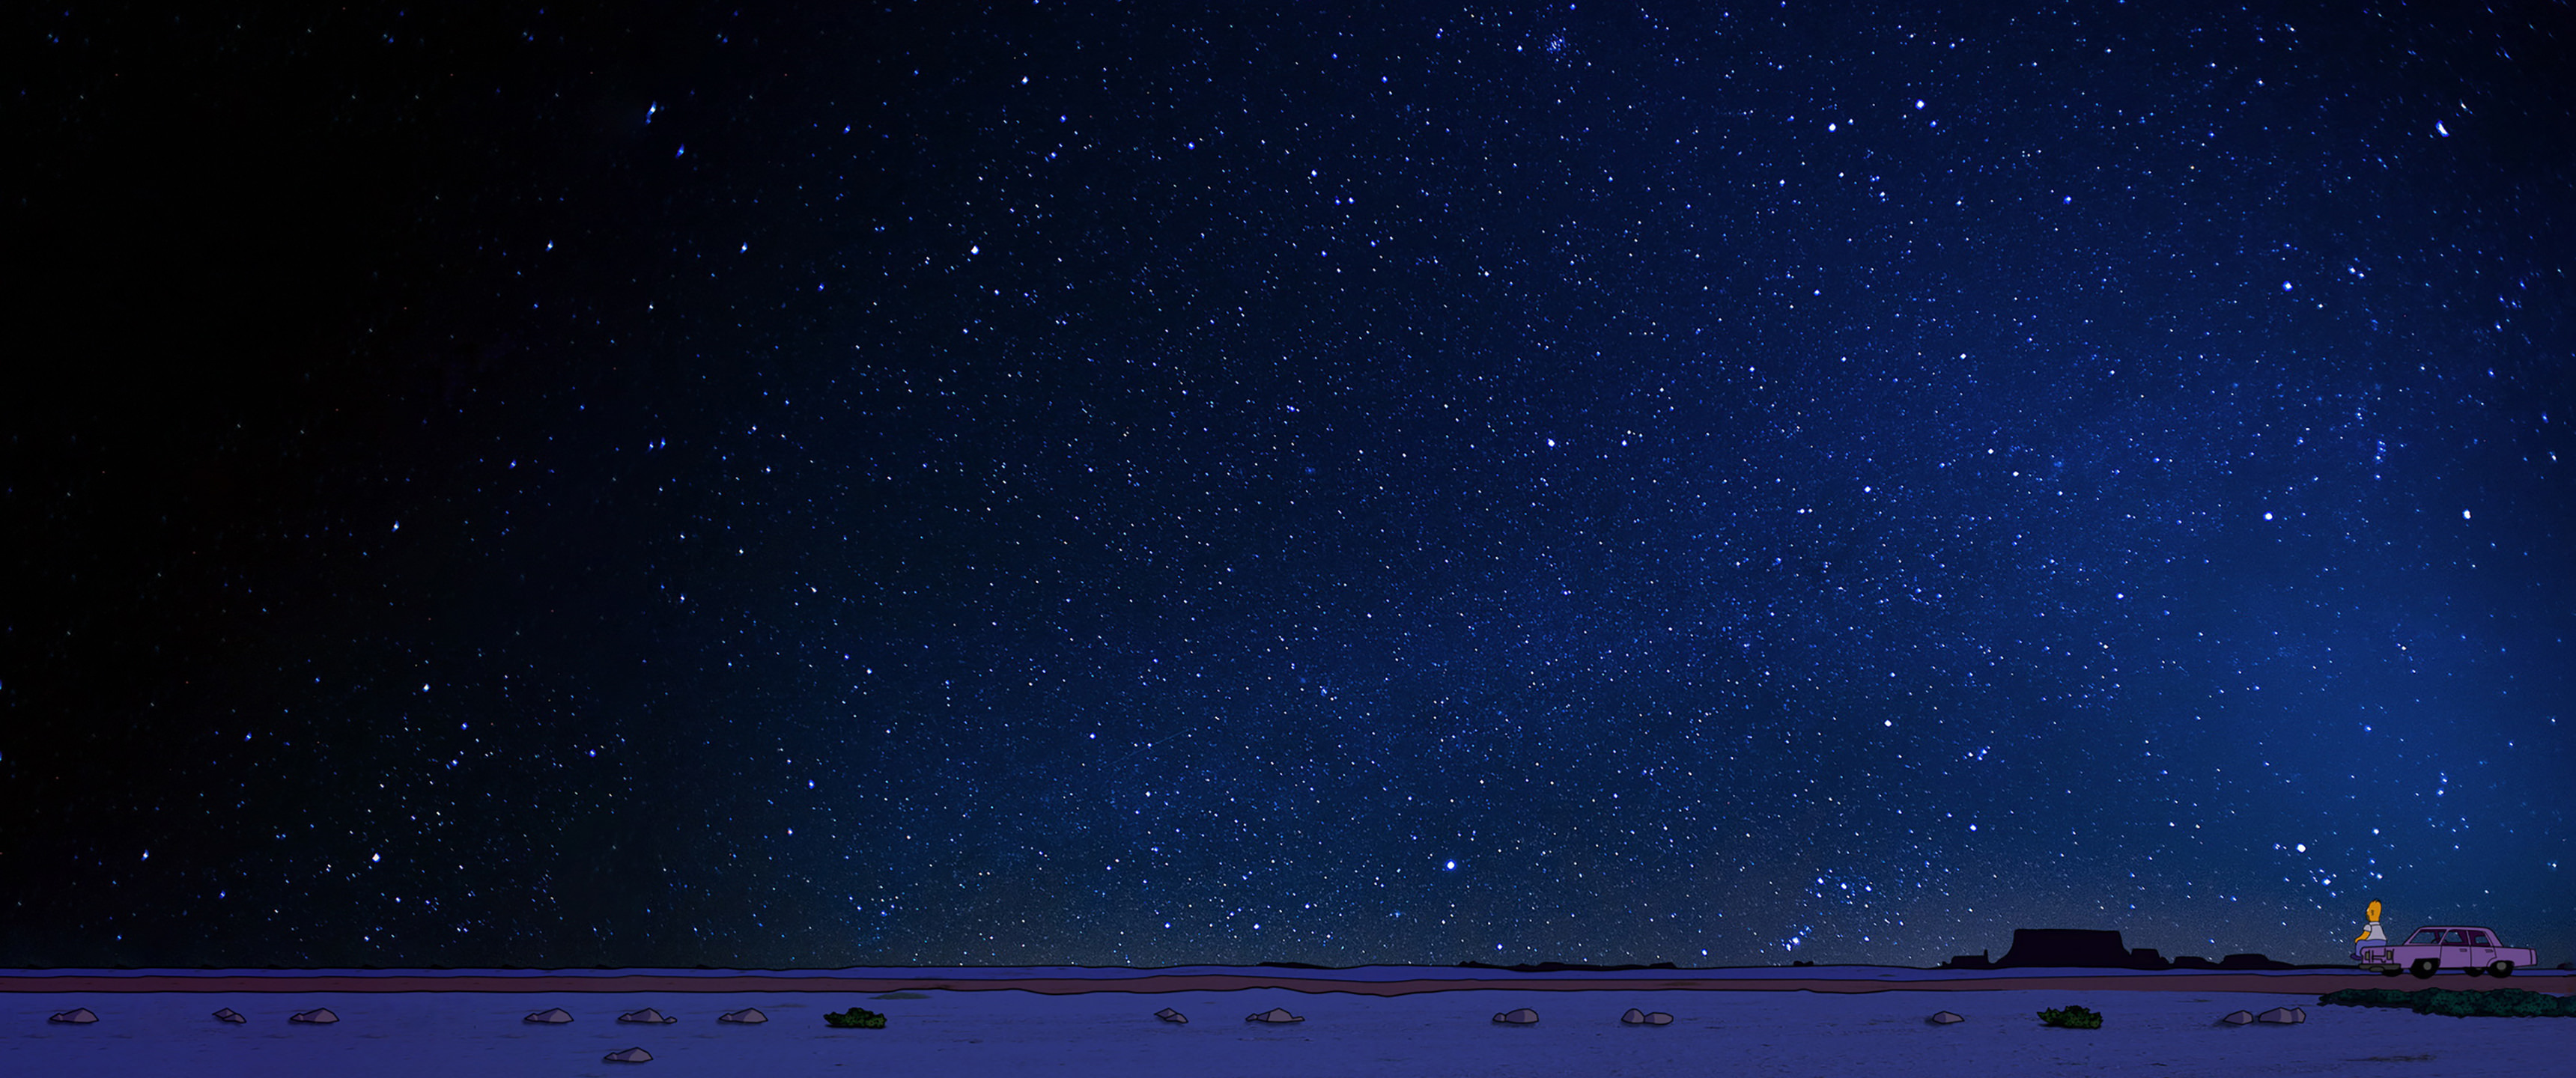 Homer Looking At The Stars Wallpaper Hd Artist 4k